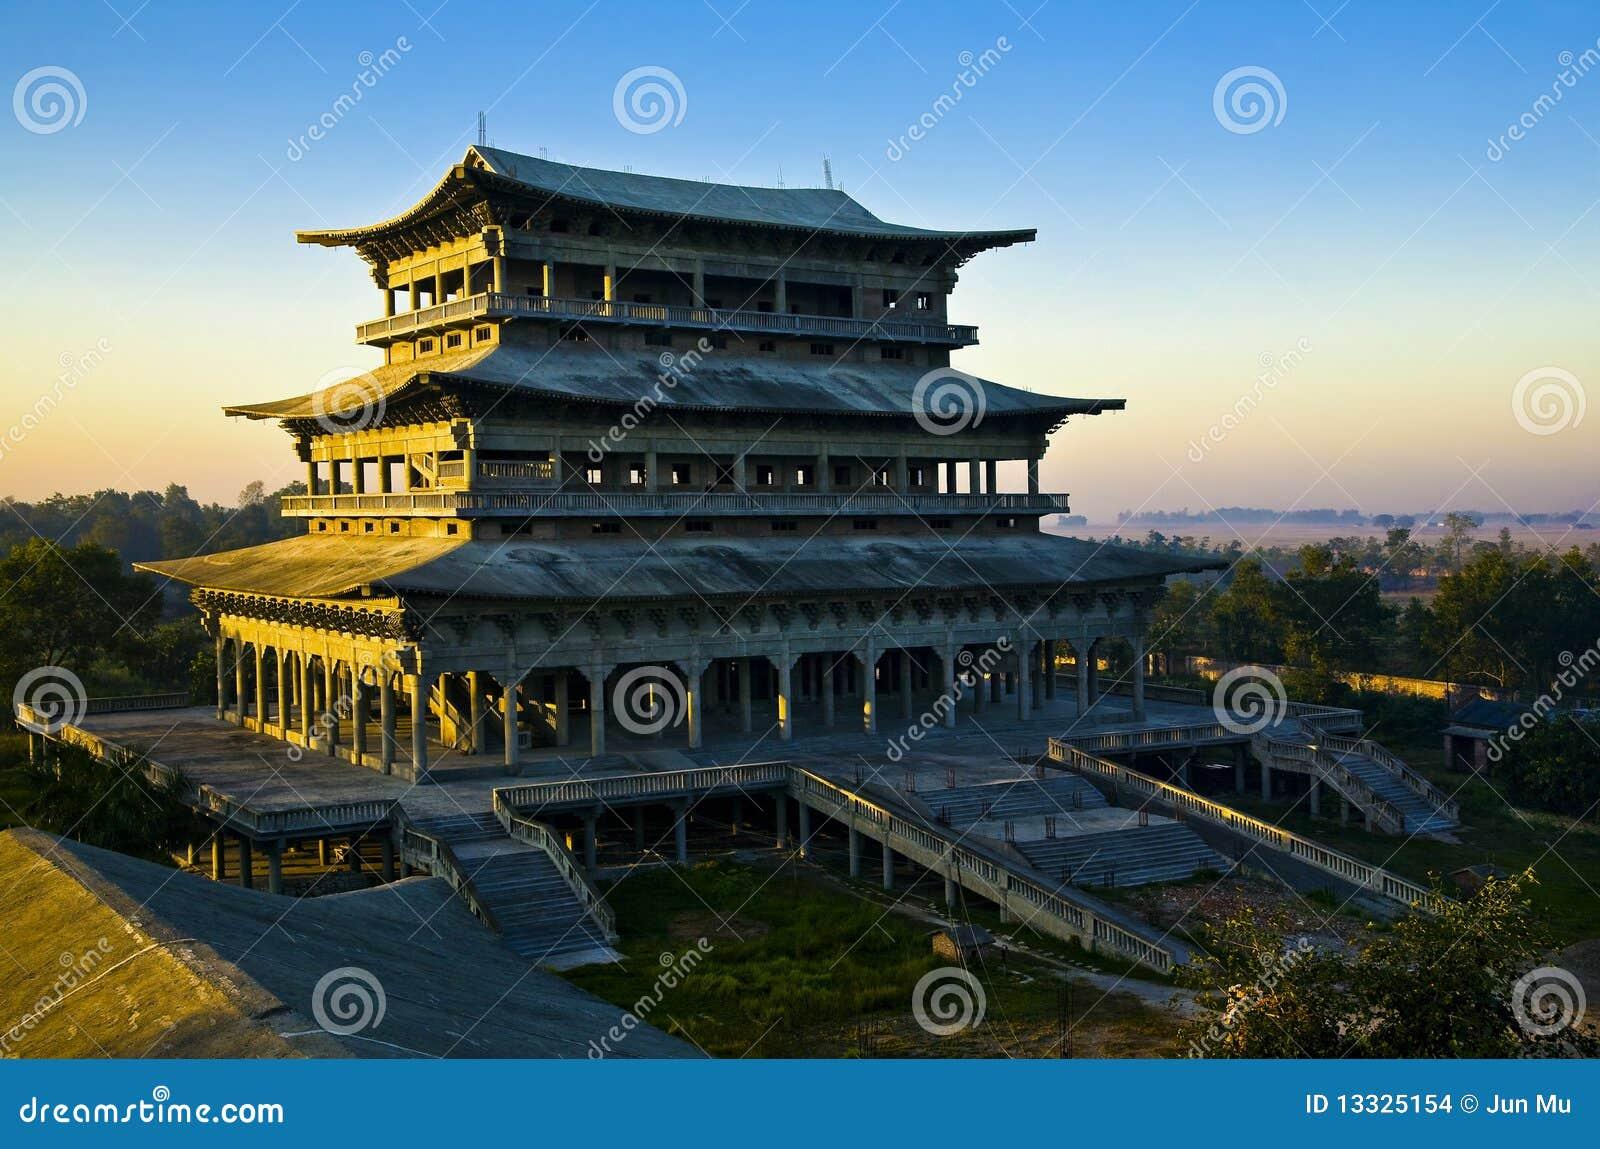 Buddyjska koreańska świątynia